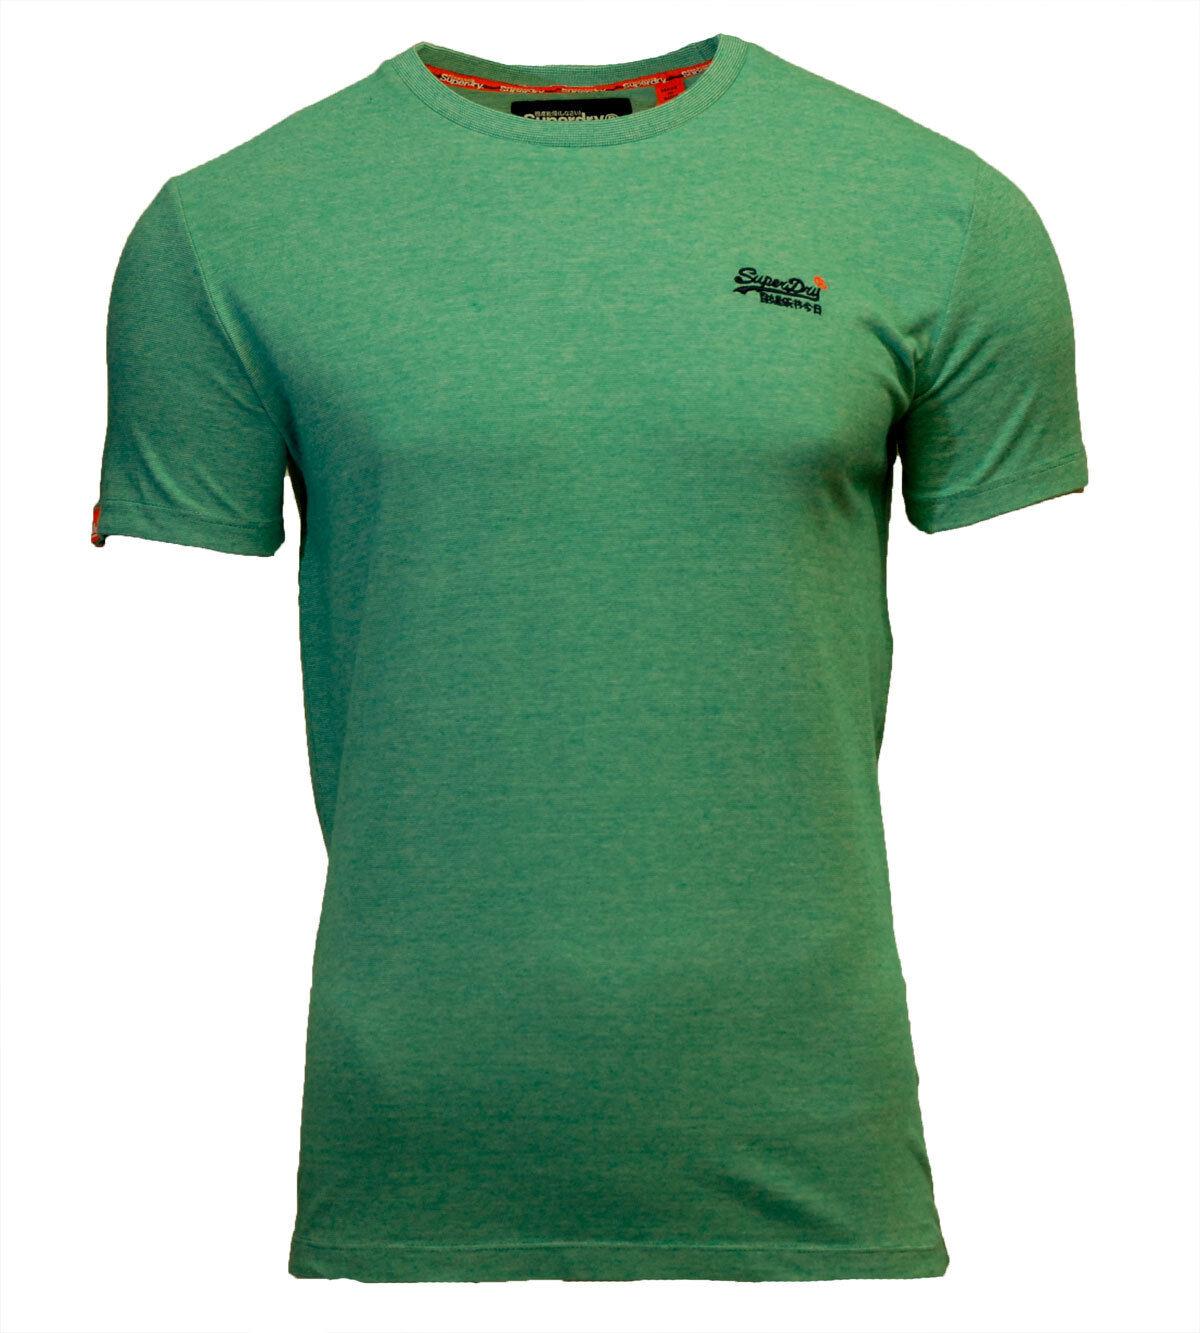 Superdry Mens New Orange Label Crew Neck Short Sleeve T Shirt Green Grit Feeder